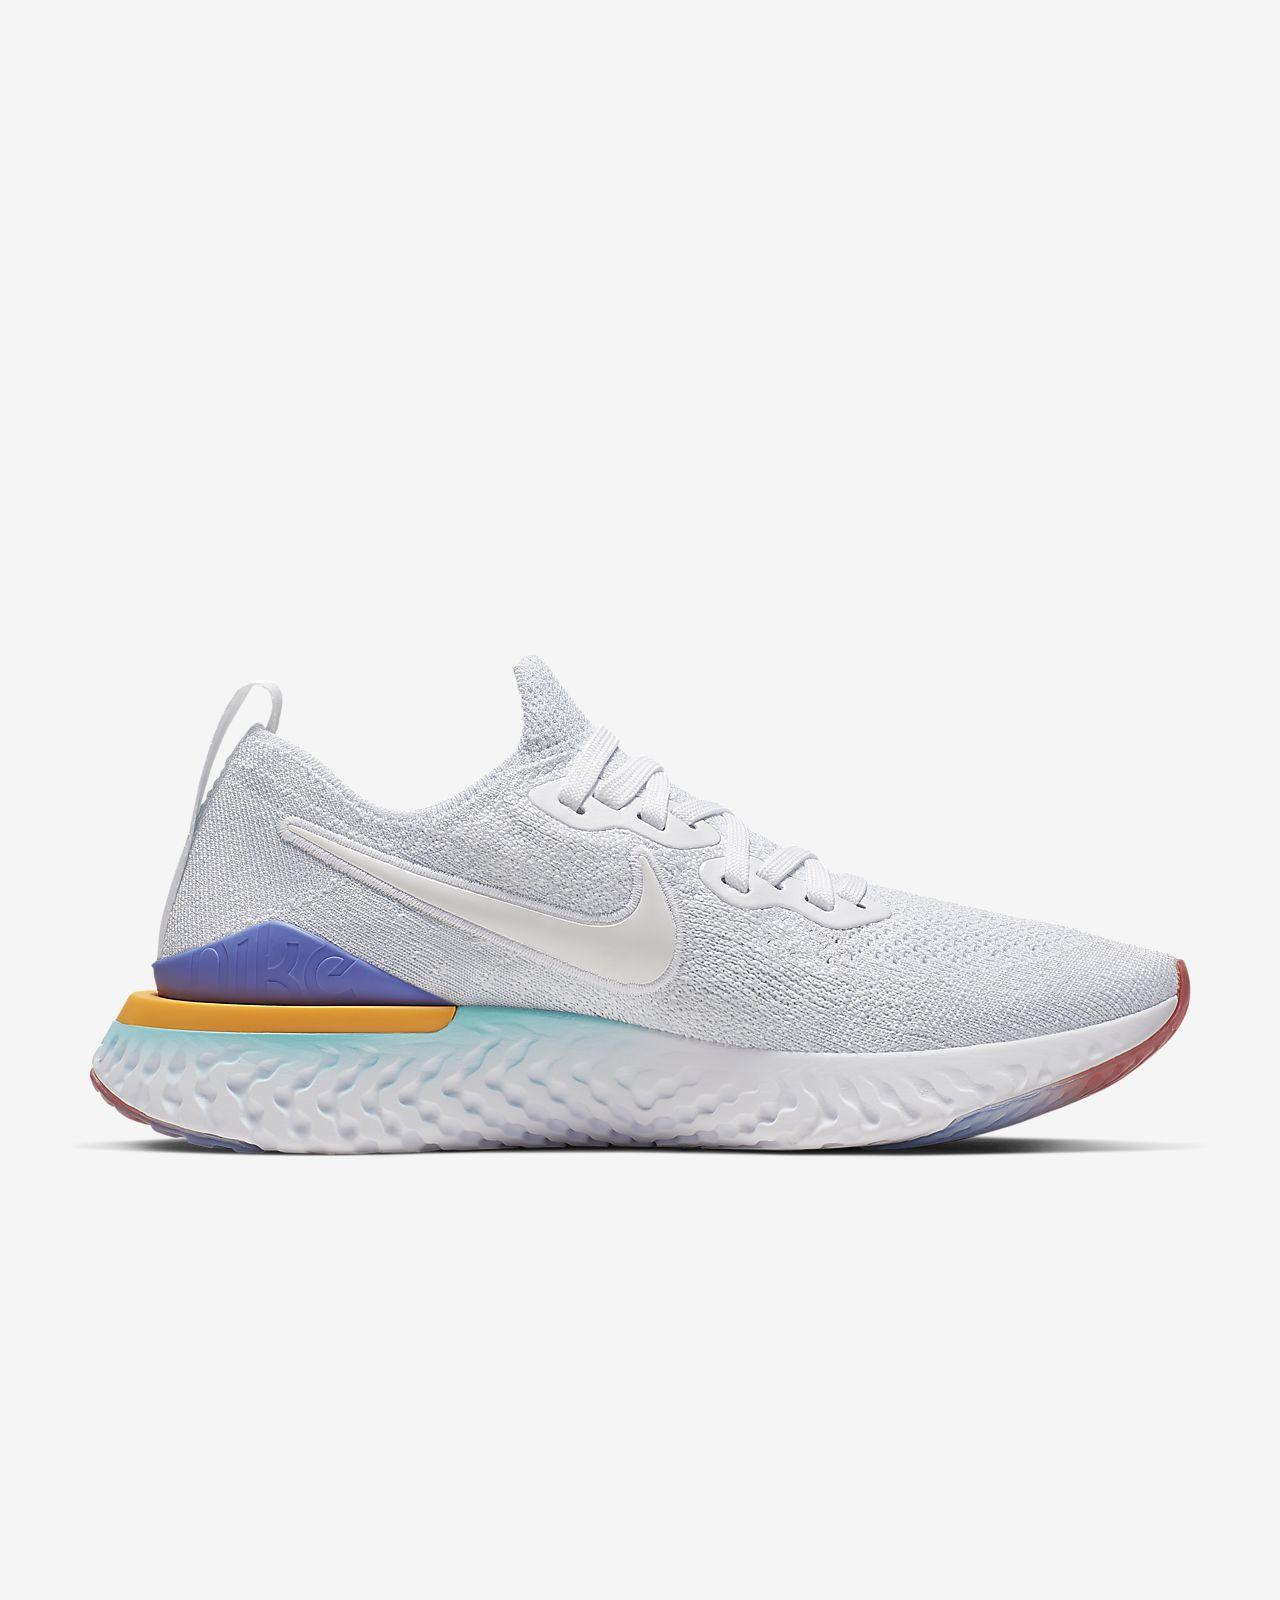 a555f13a78 Sapatilhas de running Nike Epic React Flyknit 2 para mulher. Nike.com PT